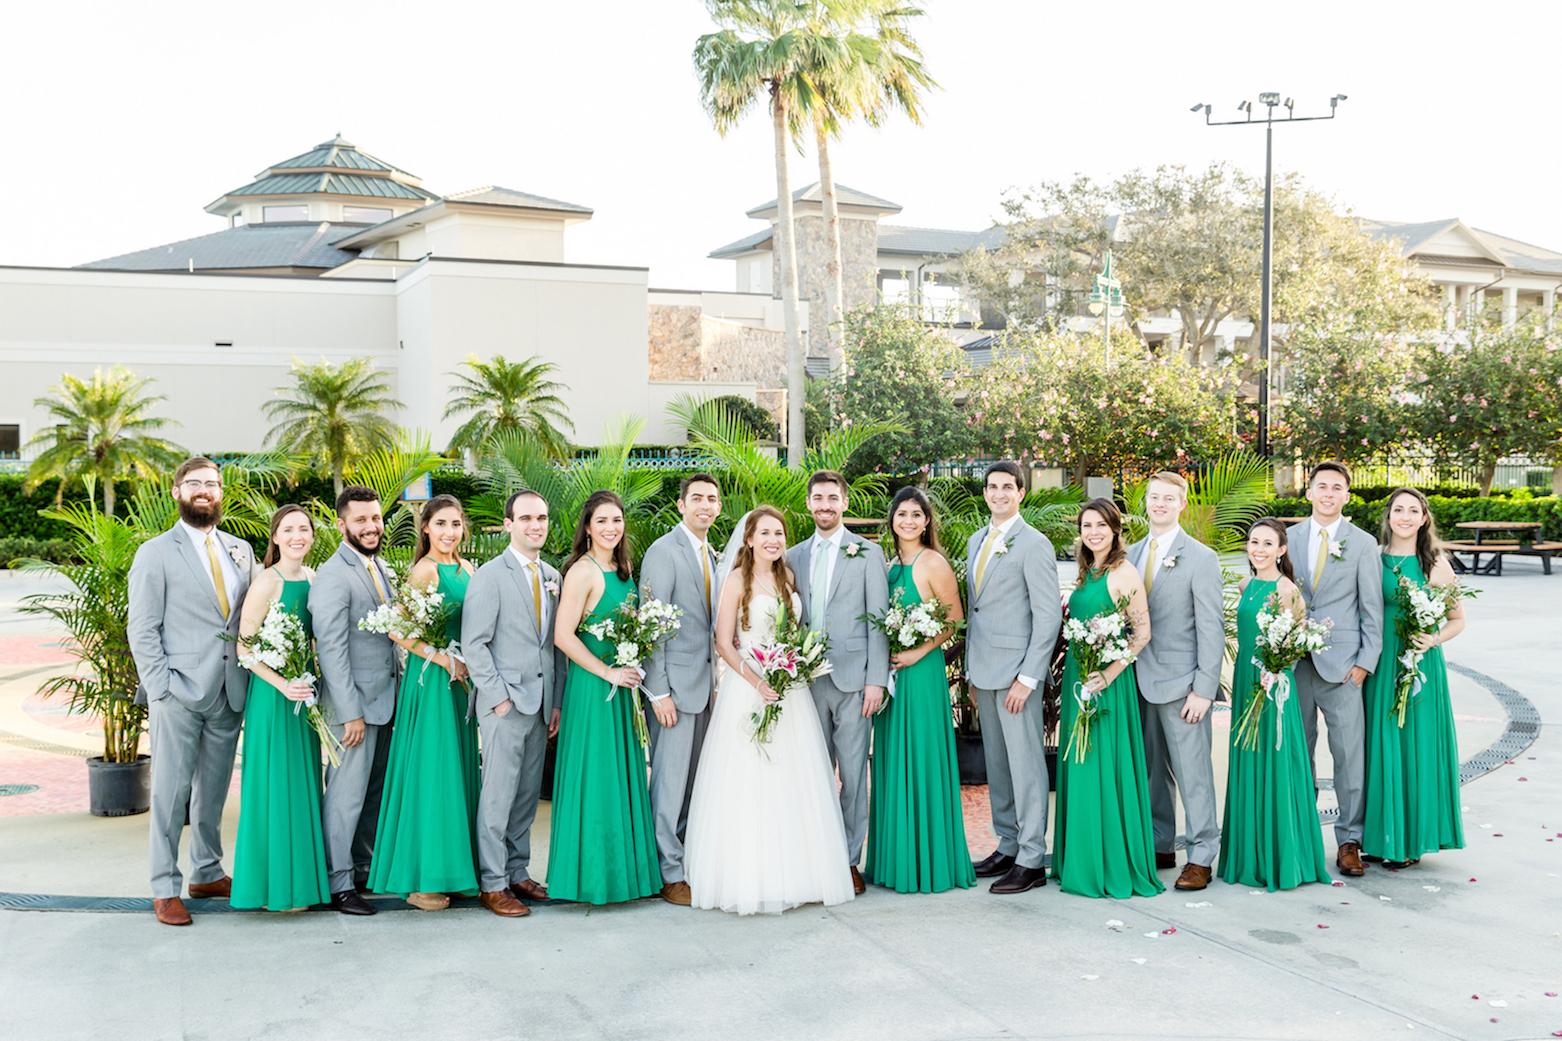 A Unique Wedding at a Seaplane Hangar in Vero Beach, FL